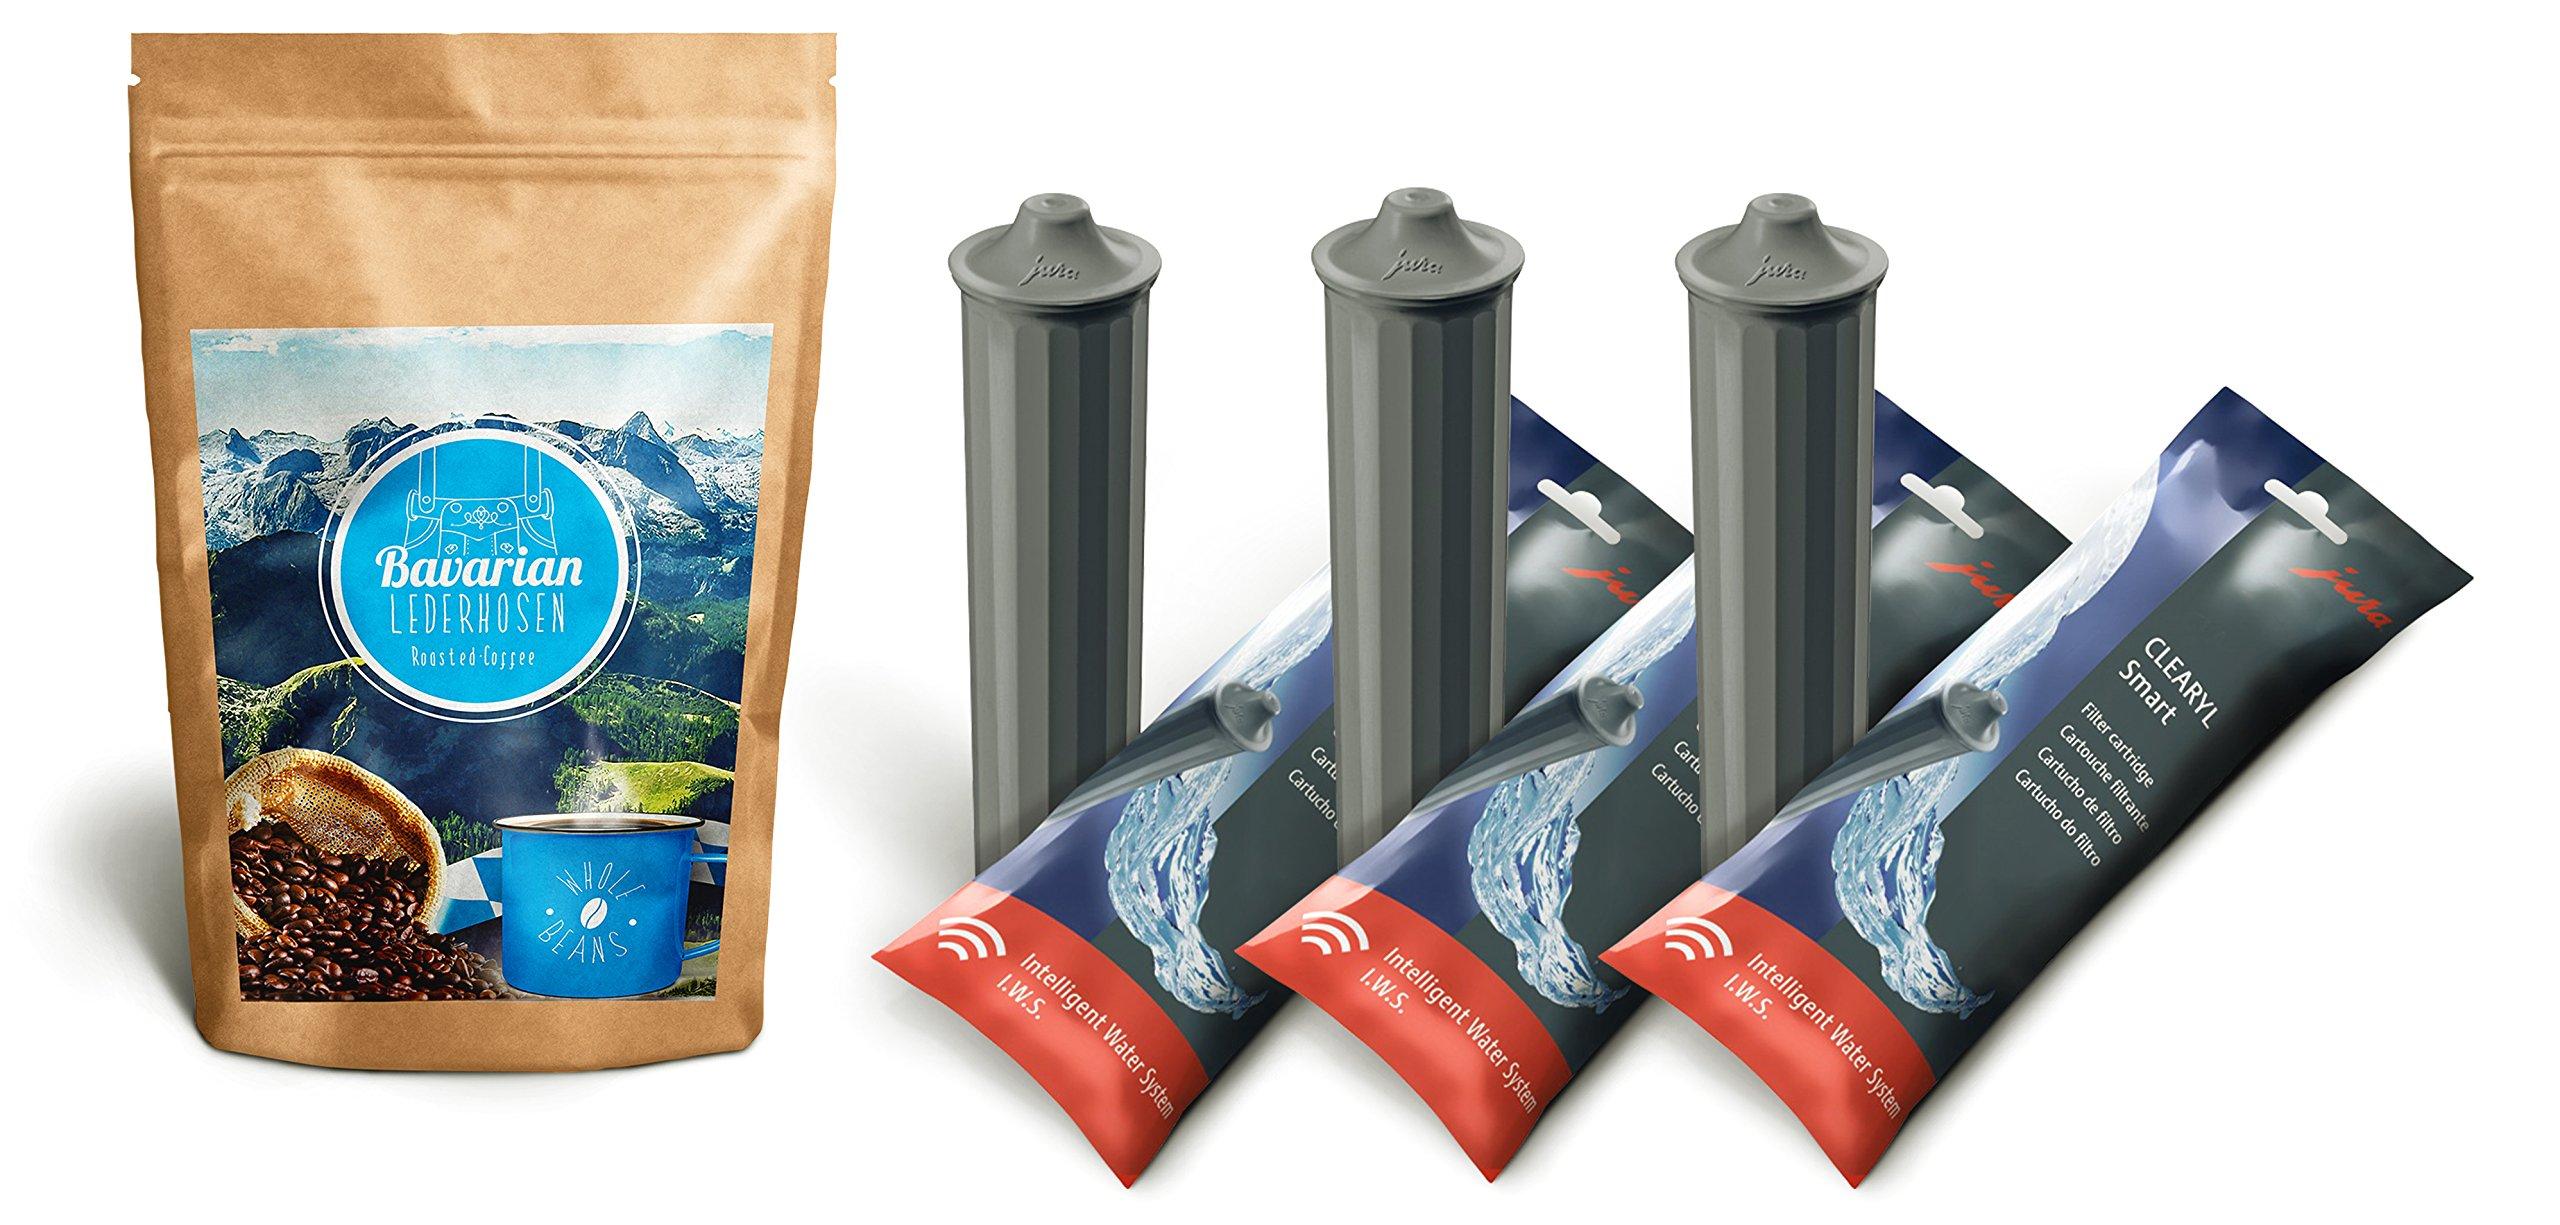 Bavarian Lederhosen Whole Beans Coffee 8.8 oz & 3 Jura Clearyl/Claris Smart Filter Cartridges by Bavarian Lederhosen Roasted Coffee